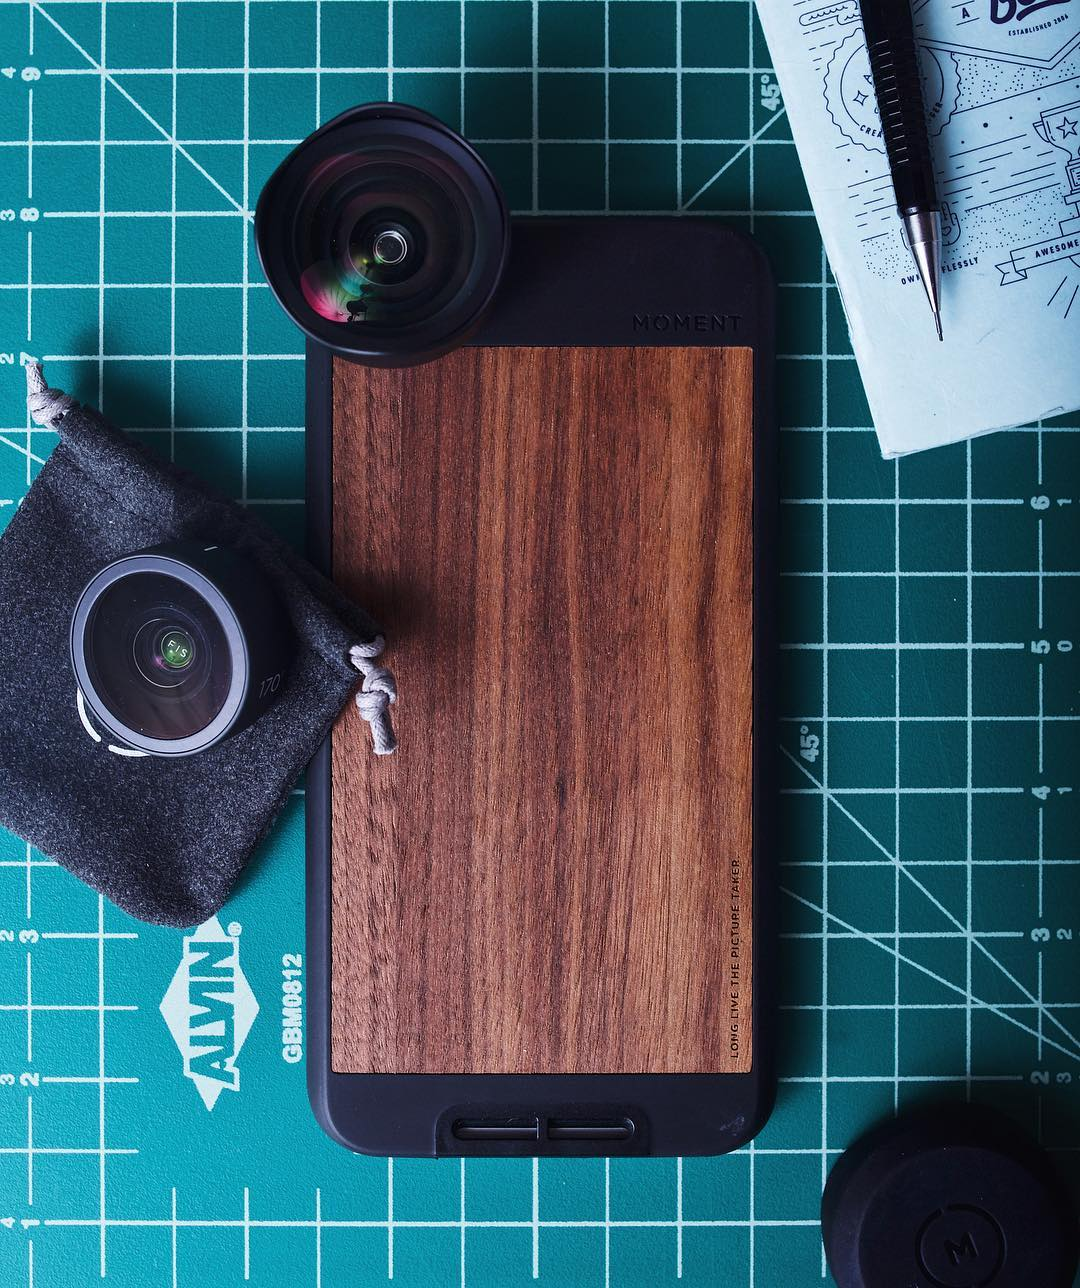 Griswold-Blog-Mobile-Photography-Moment-Lenses 3.jpg